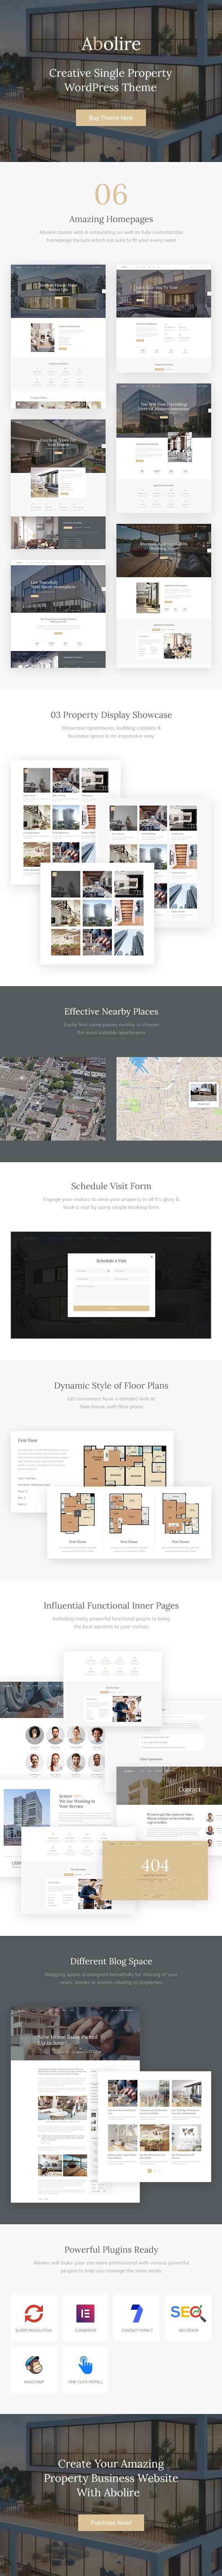 Abolire - Single Property WordPress Theme - 4